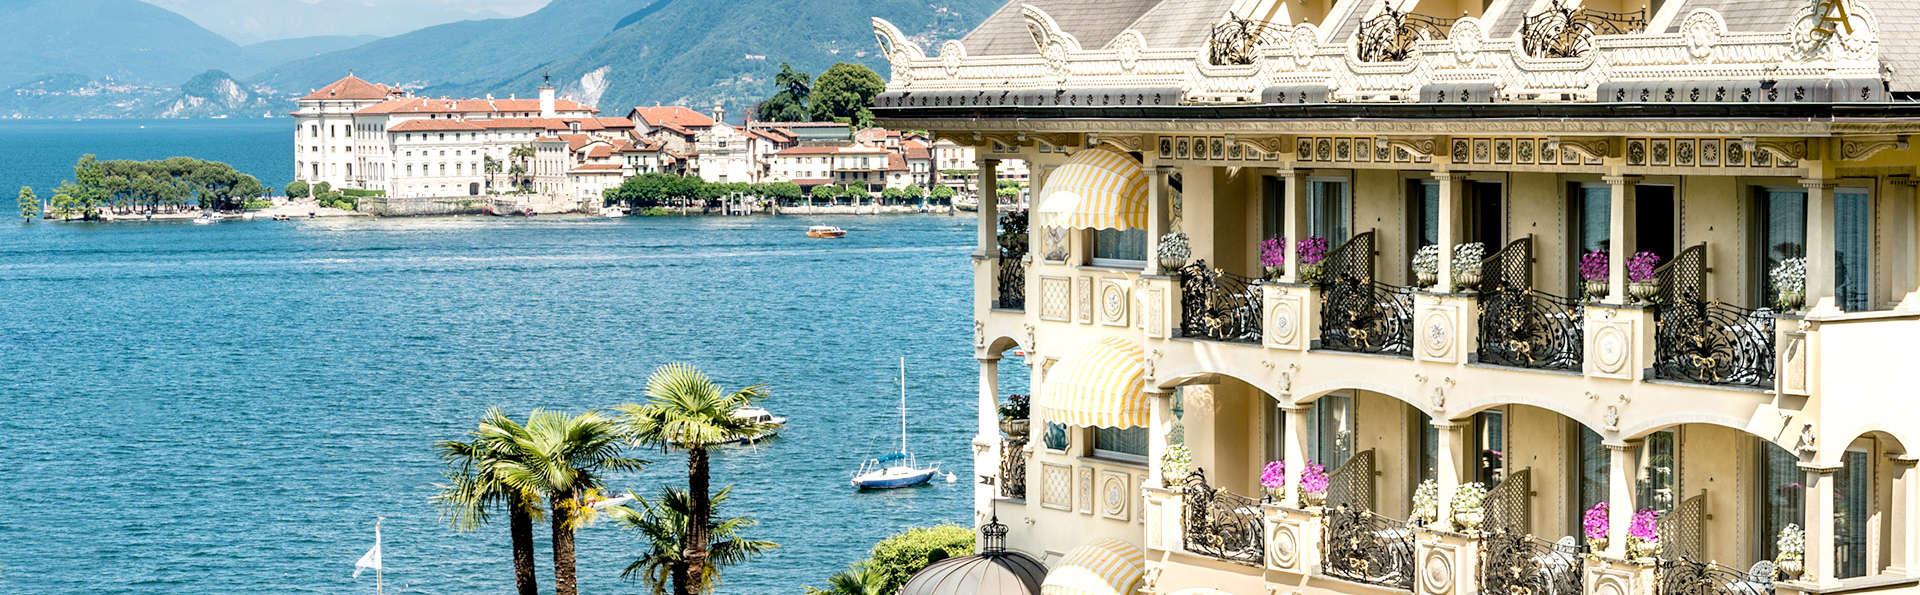 Hotel Villa e Palazzo Aminta - Edit_Front2.jpg